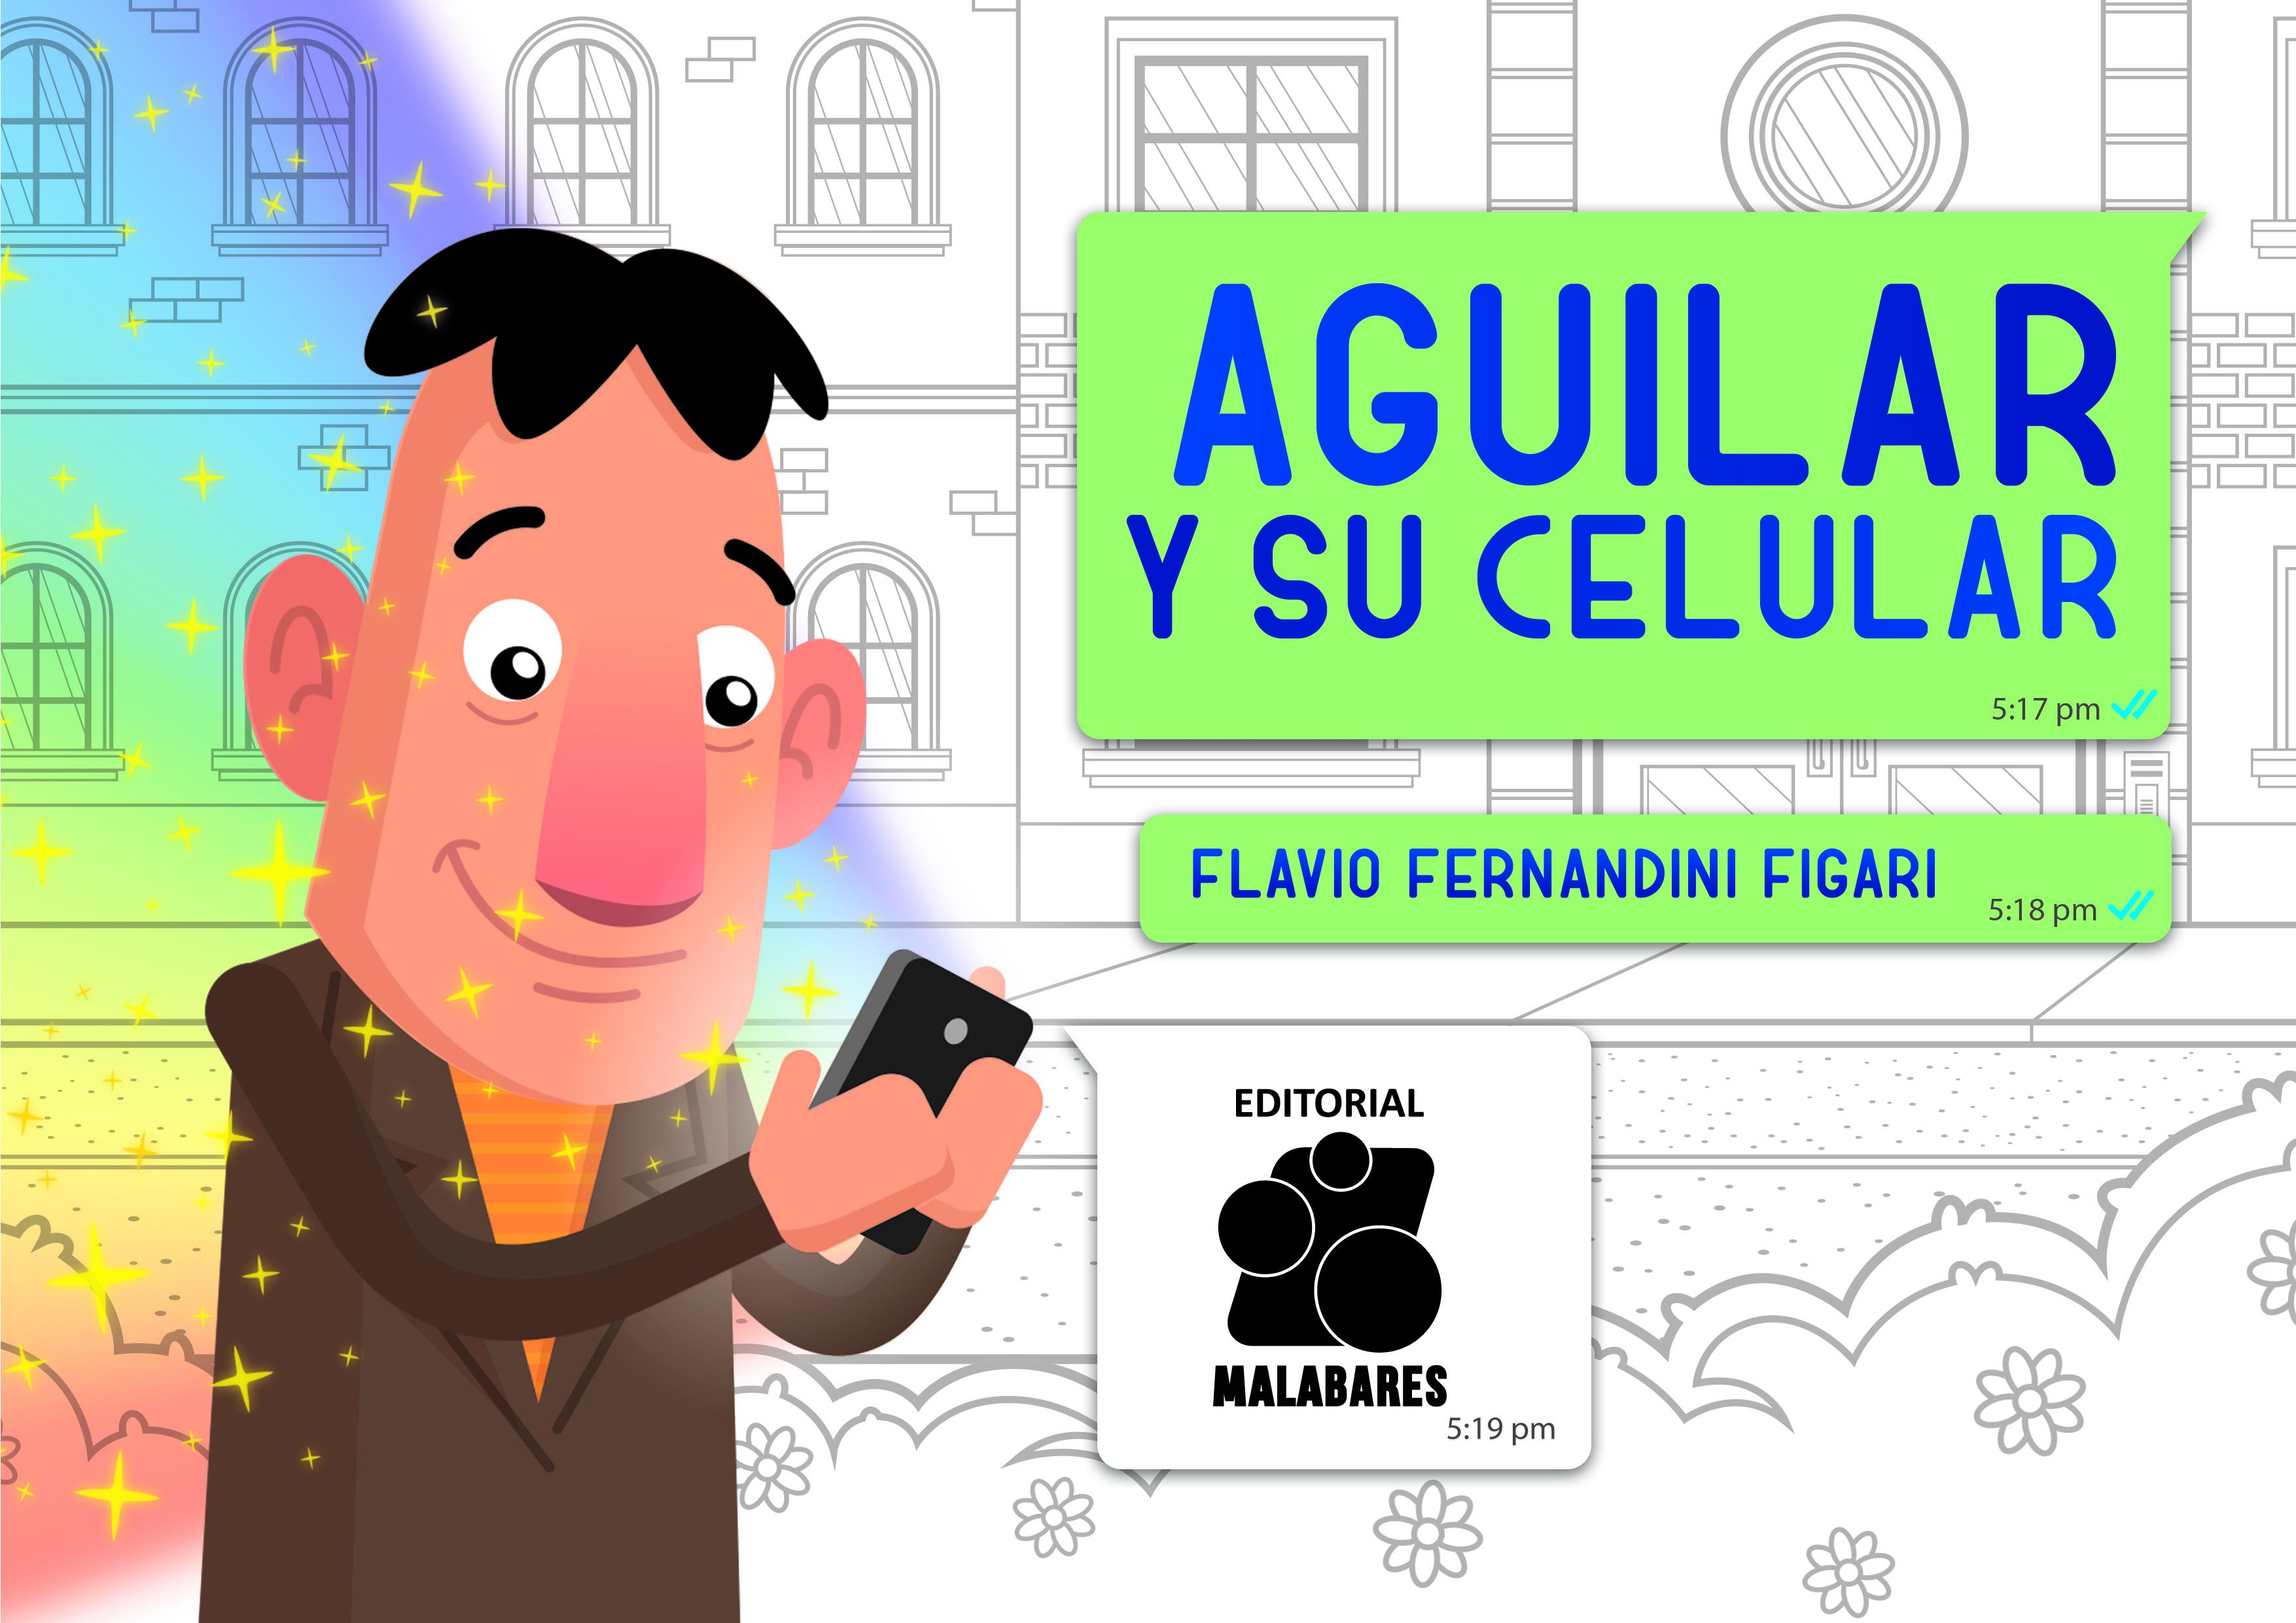 Aguilar y su celular